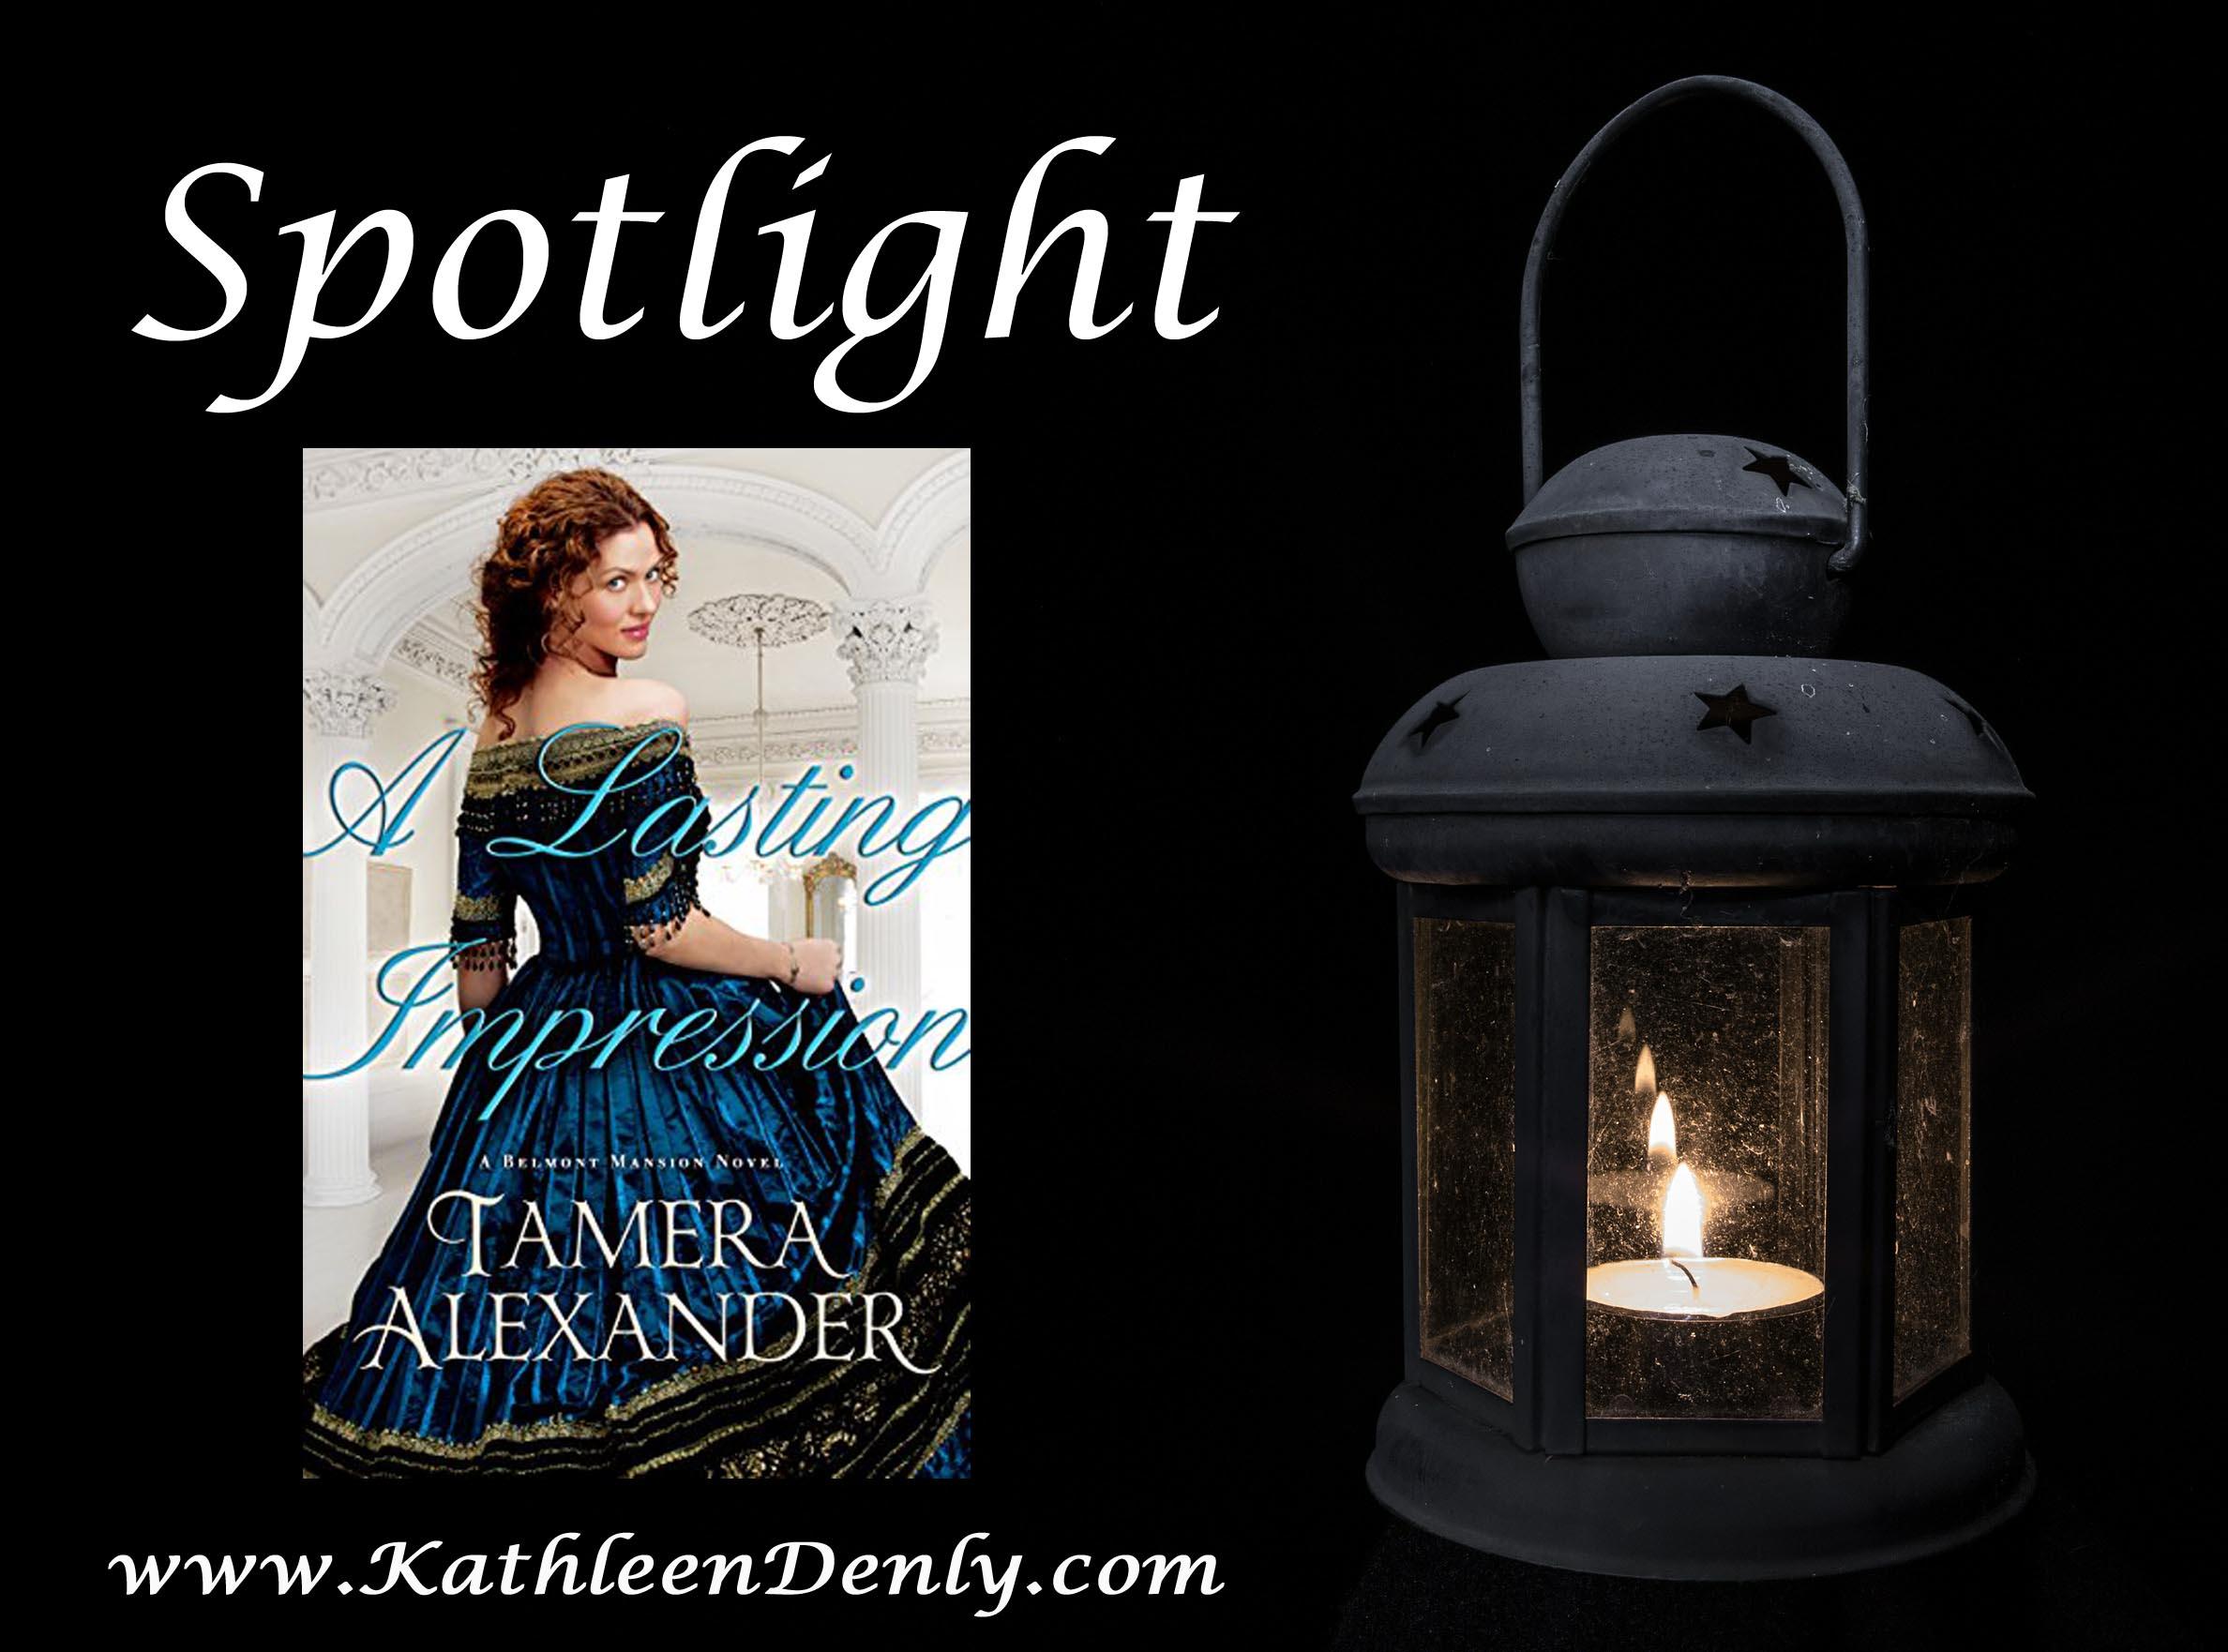 Spotlight - A Lasting Impression